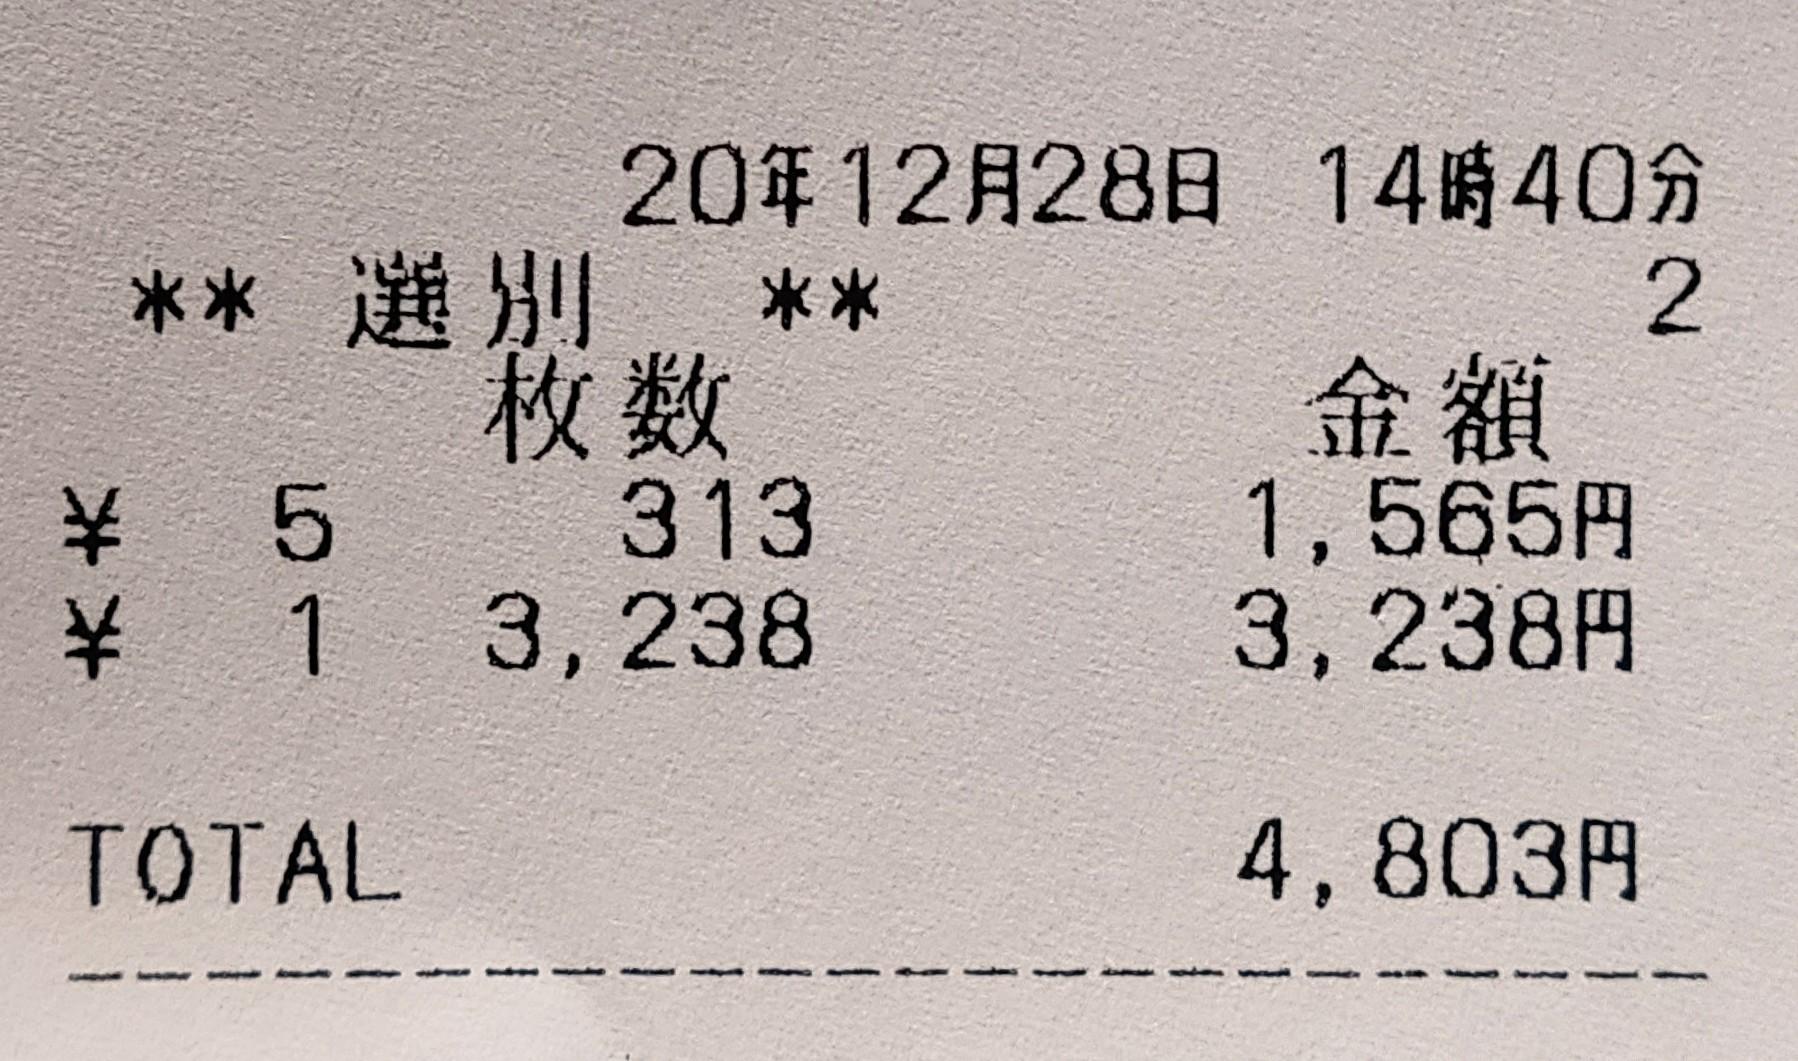 f:id:atsuhiro-me:20201228150127j:plain:w360